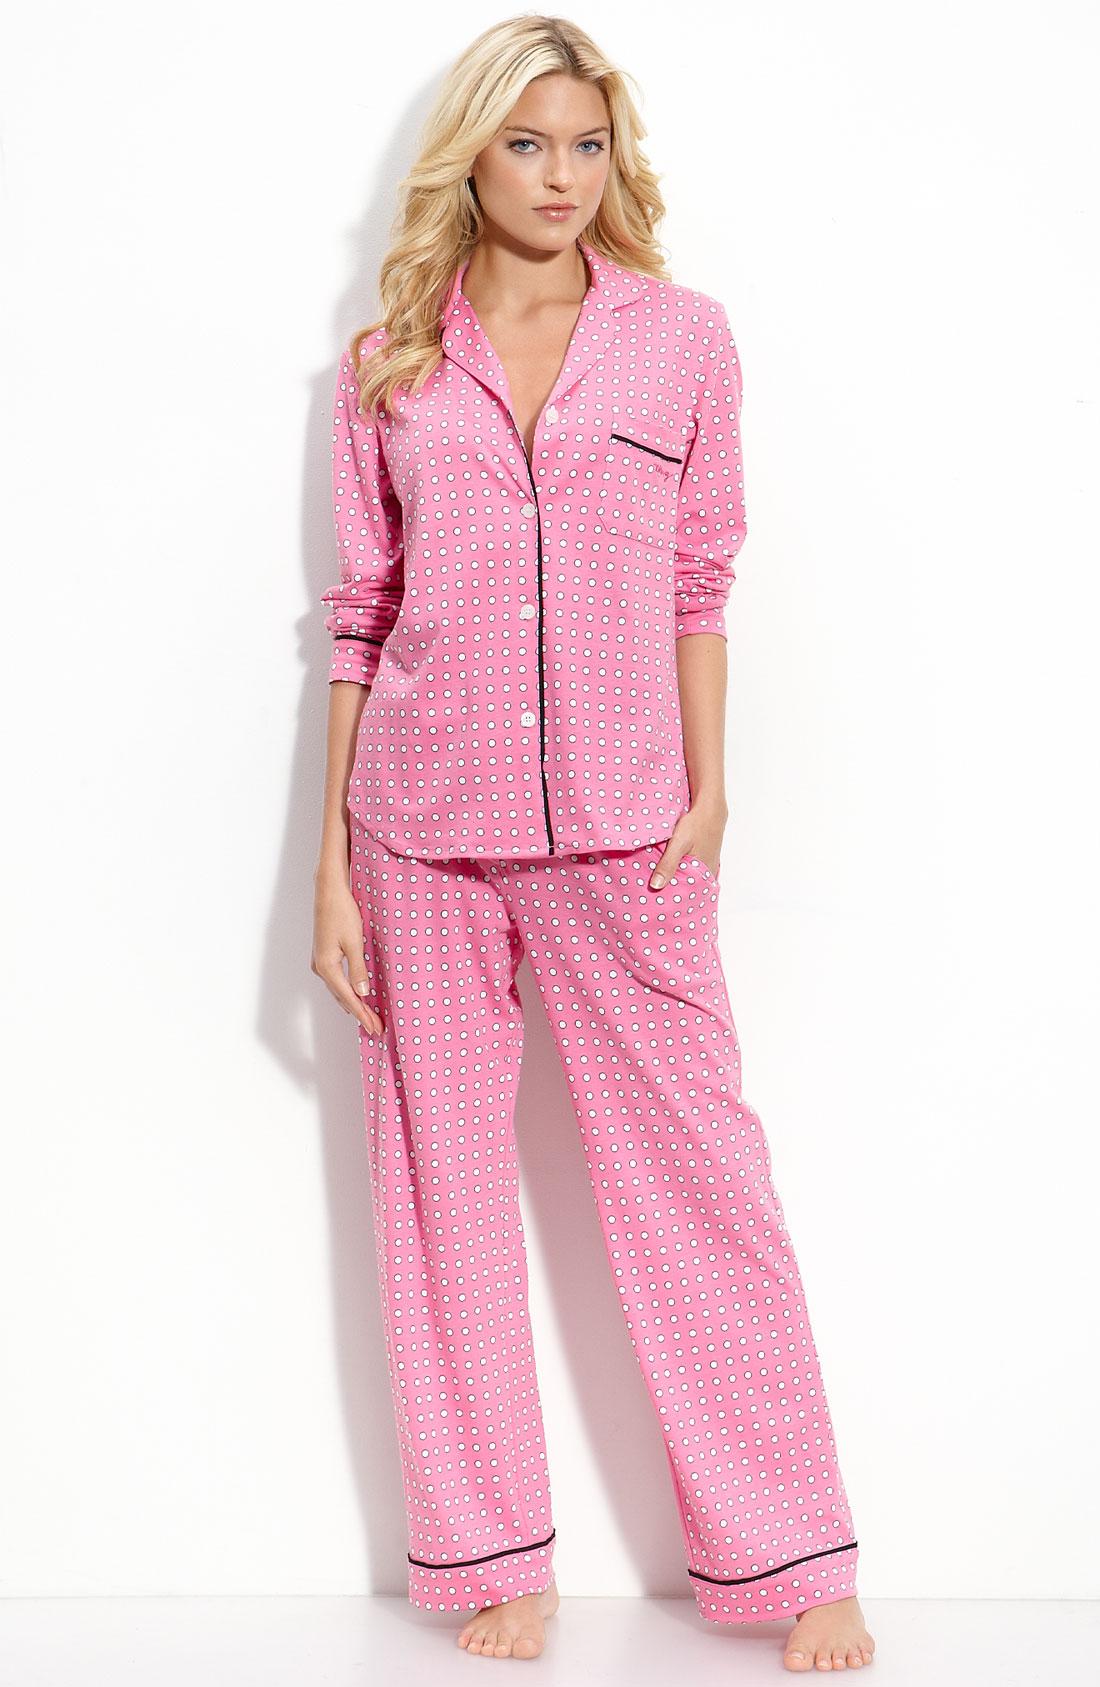 Dkny Print Knit Pajama Set In Pink Pink Sorbet Dot Lyst